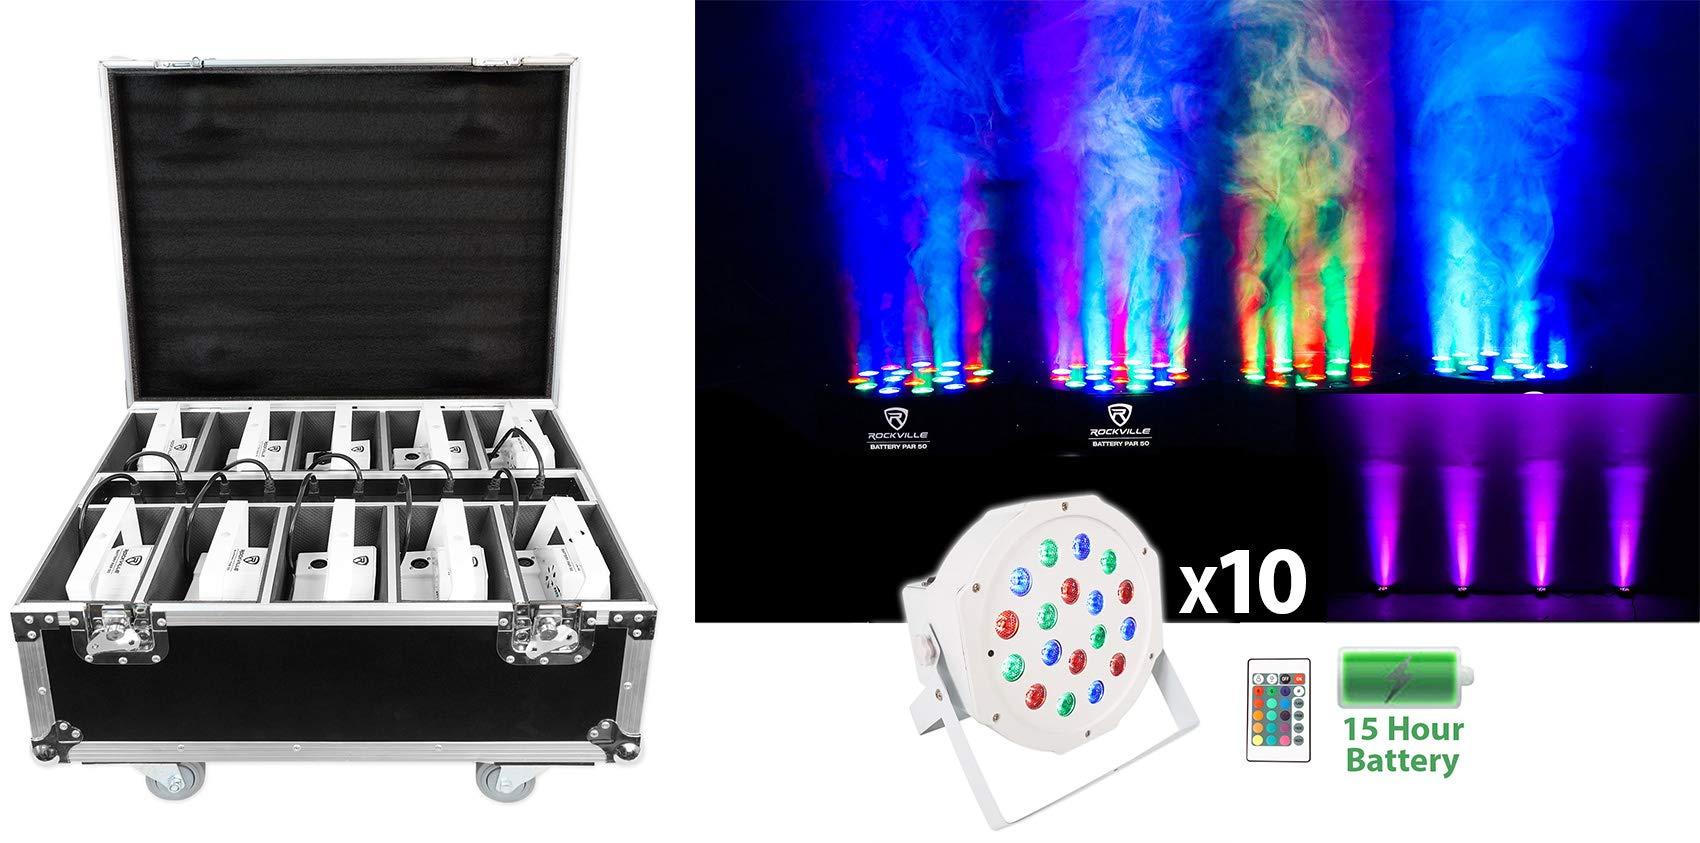 Rockville BATTERY PAR PACK 50 WHITE (10) Rechargeable Wash Lights+Charging Case